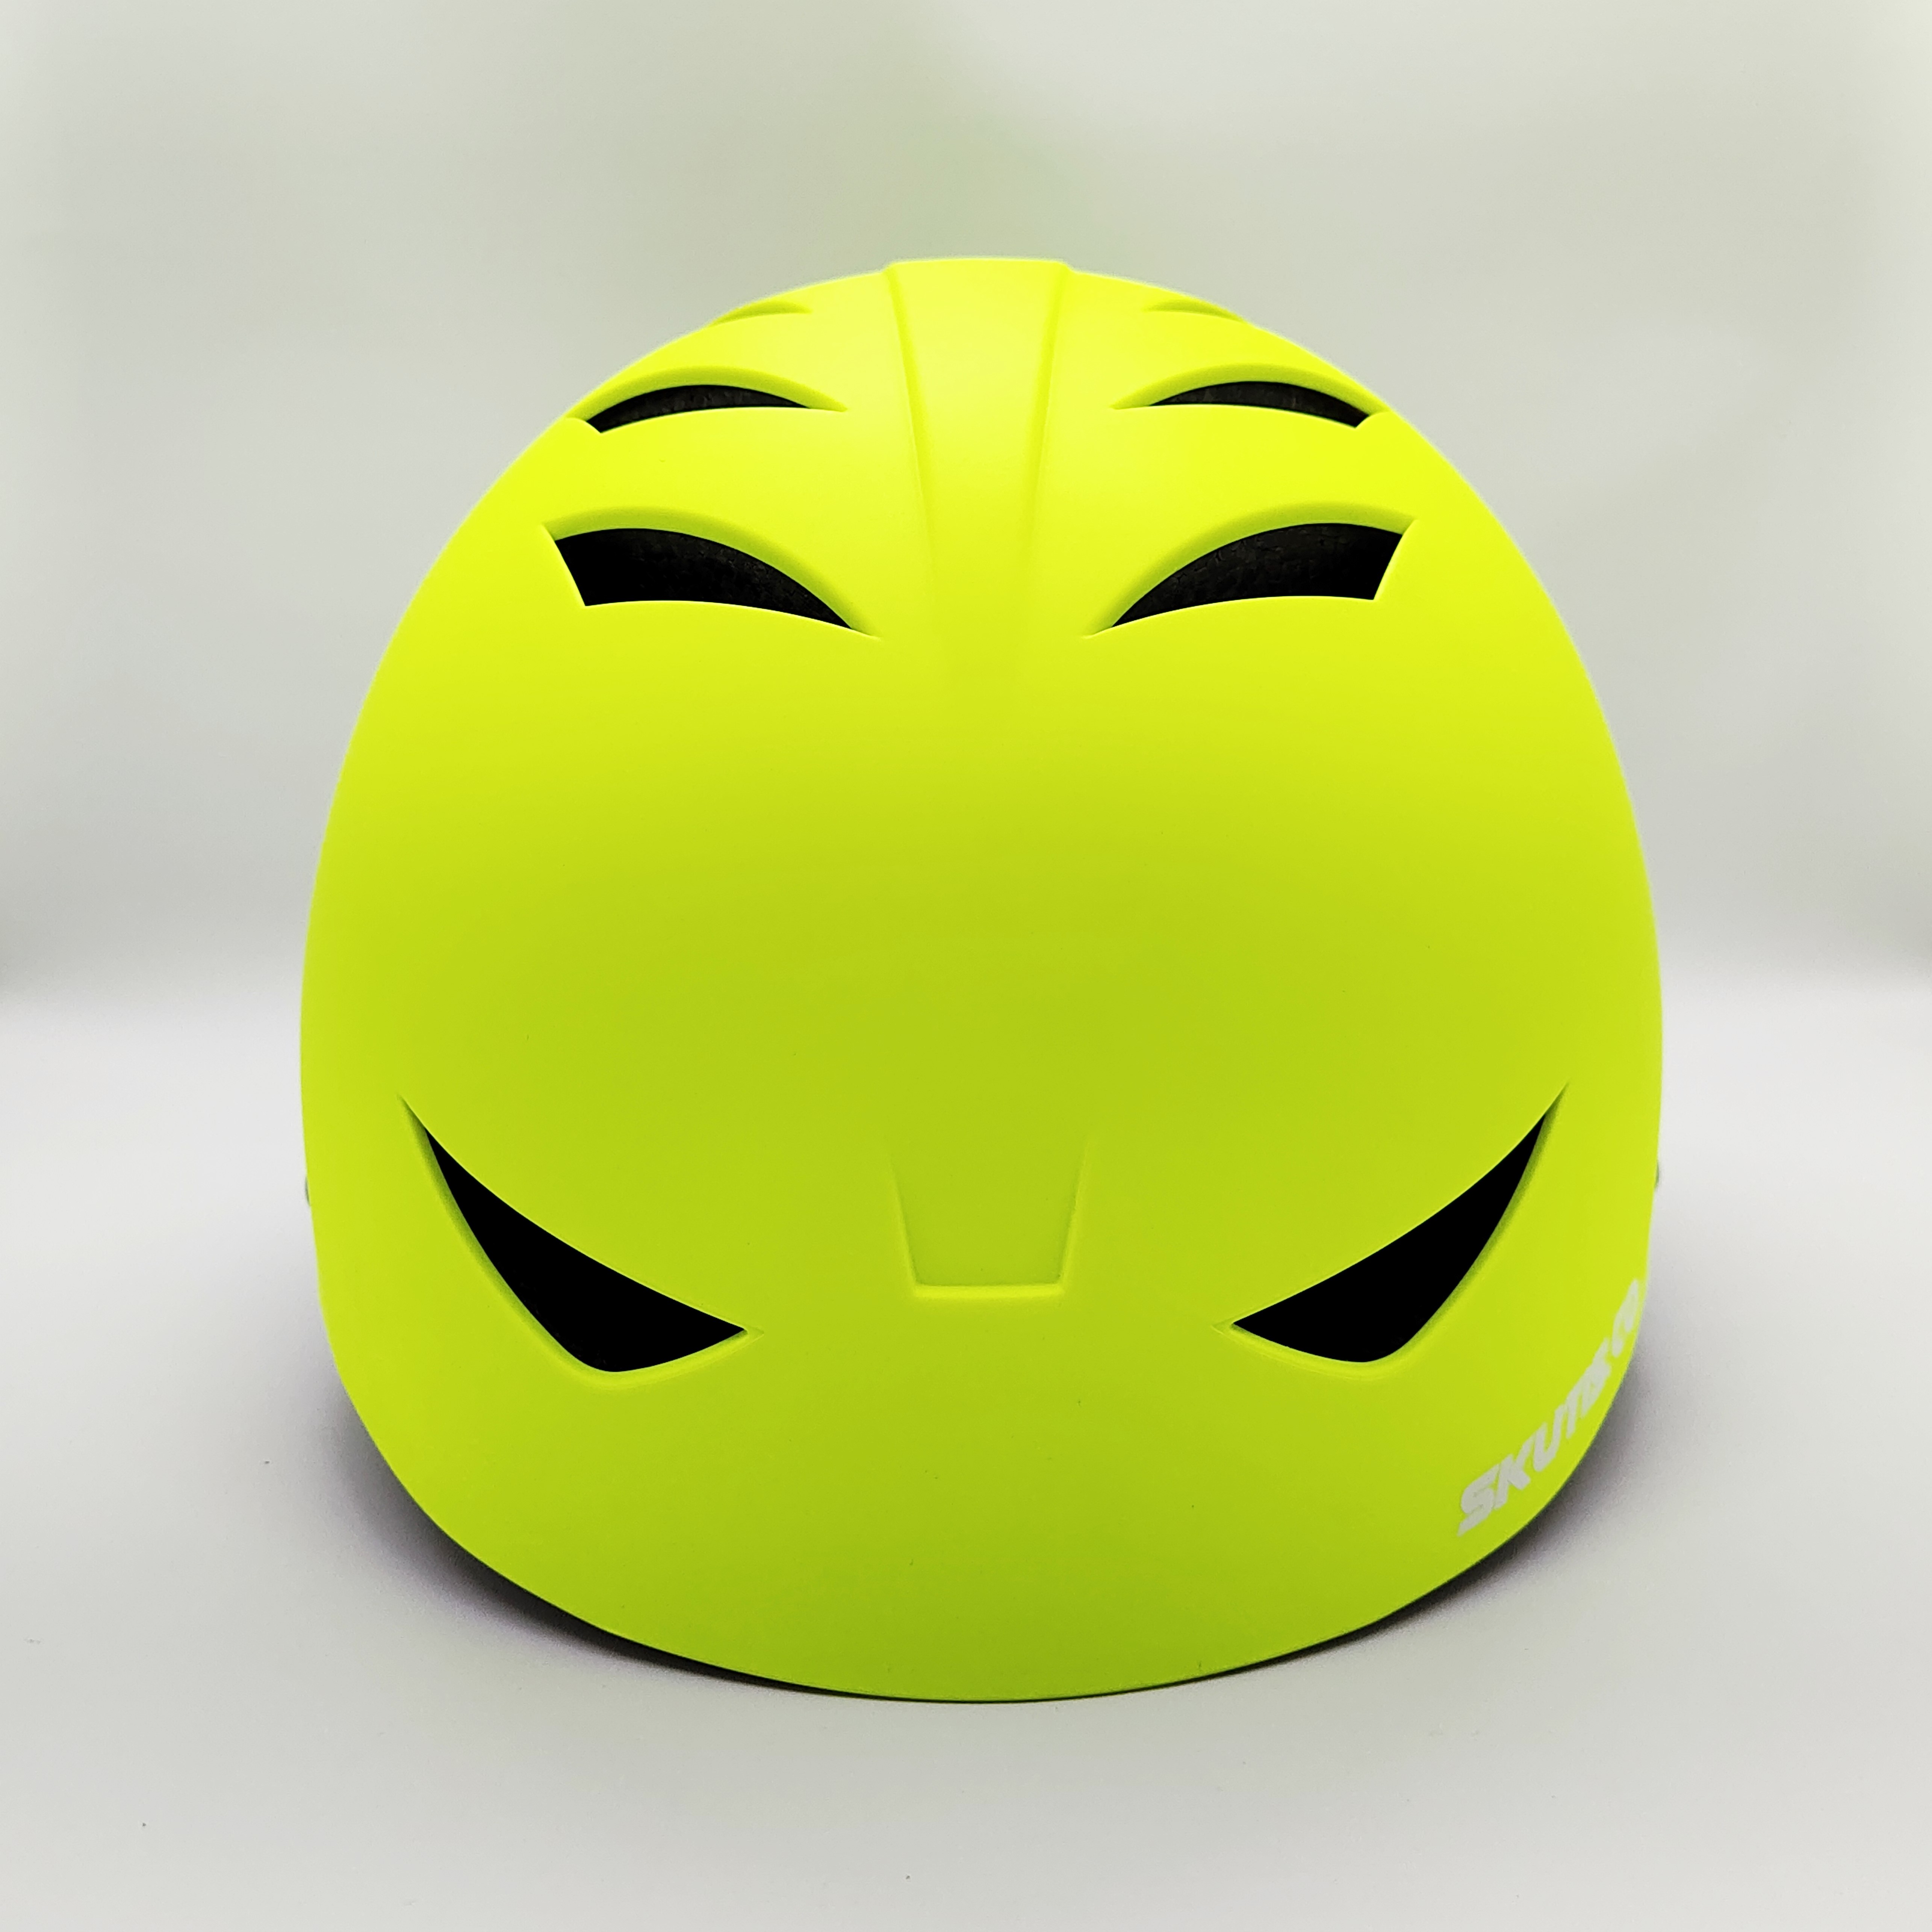 IMG 20200511 115301 - Skutis Gear Helmet